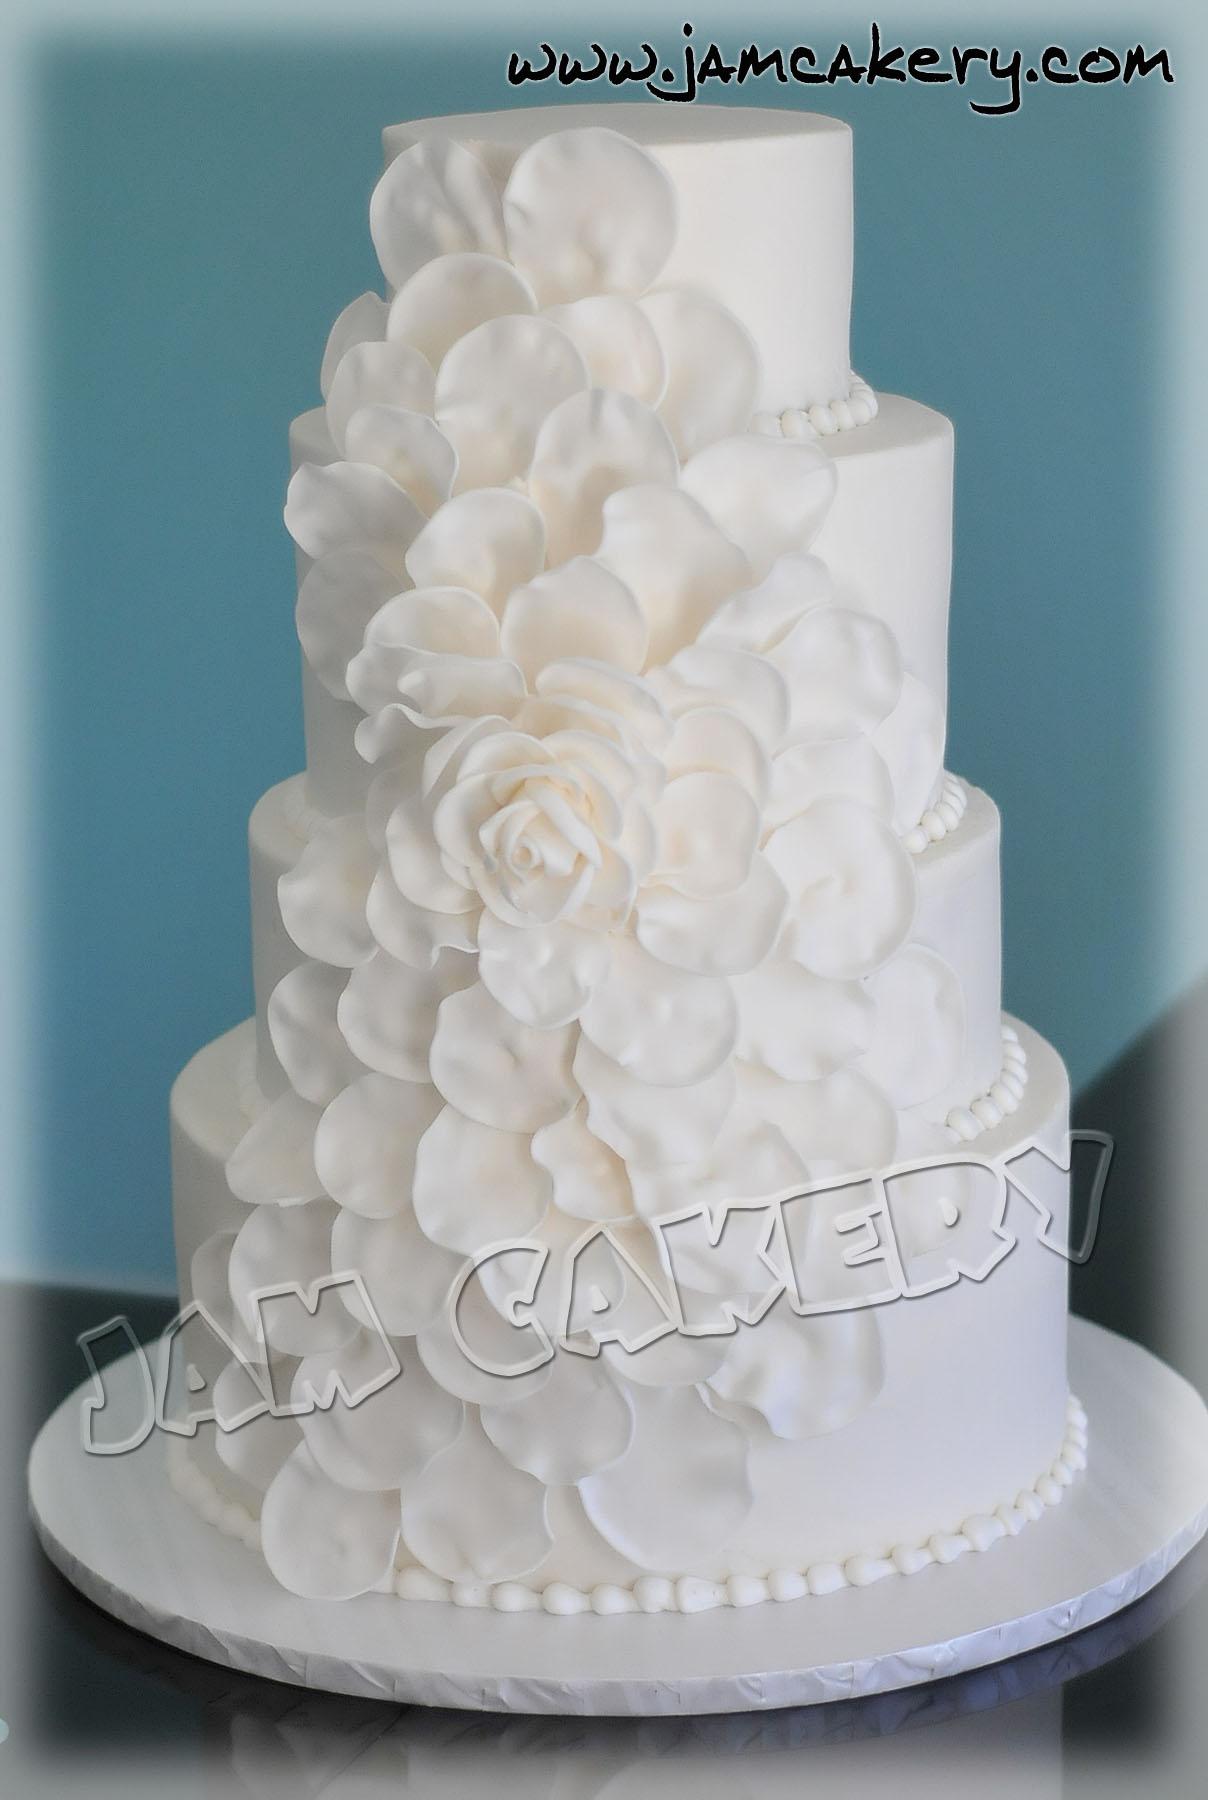 Petal Wedding Cake J A M Cakery